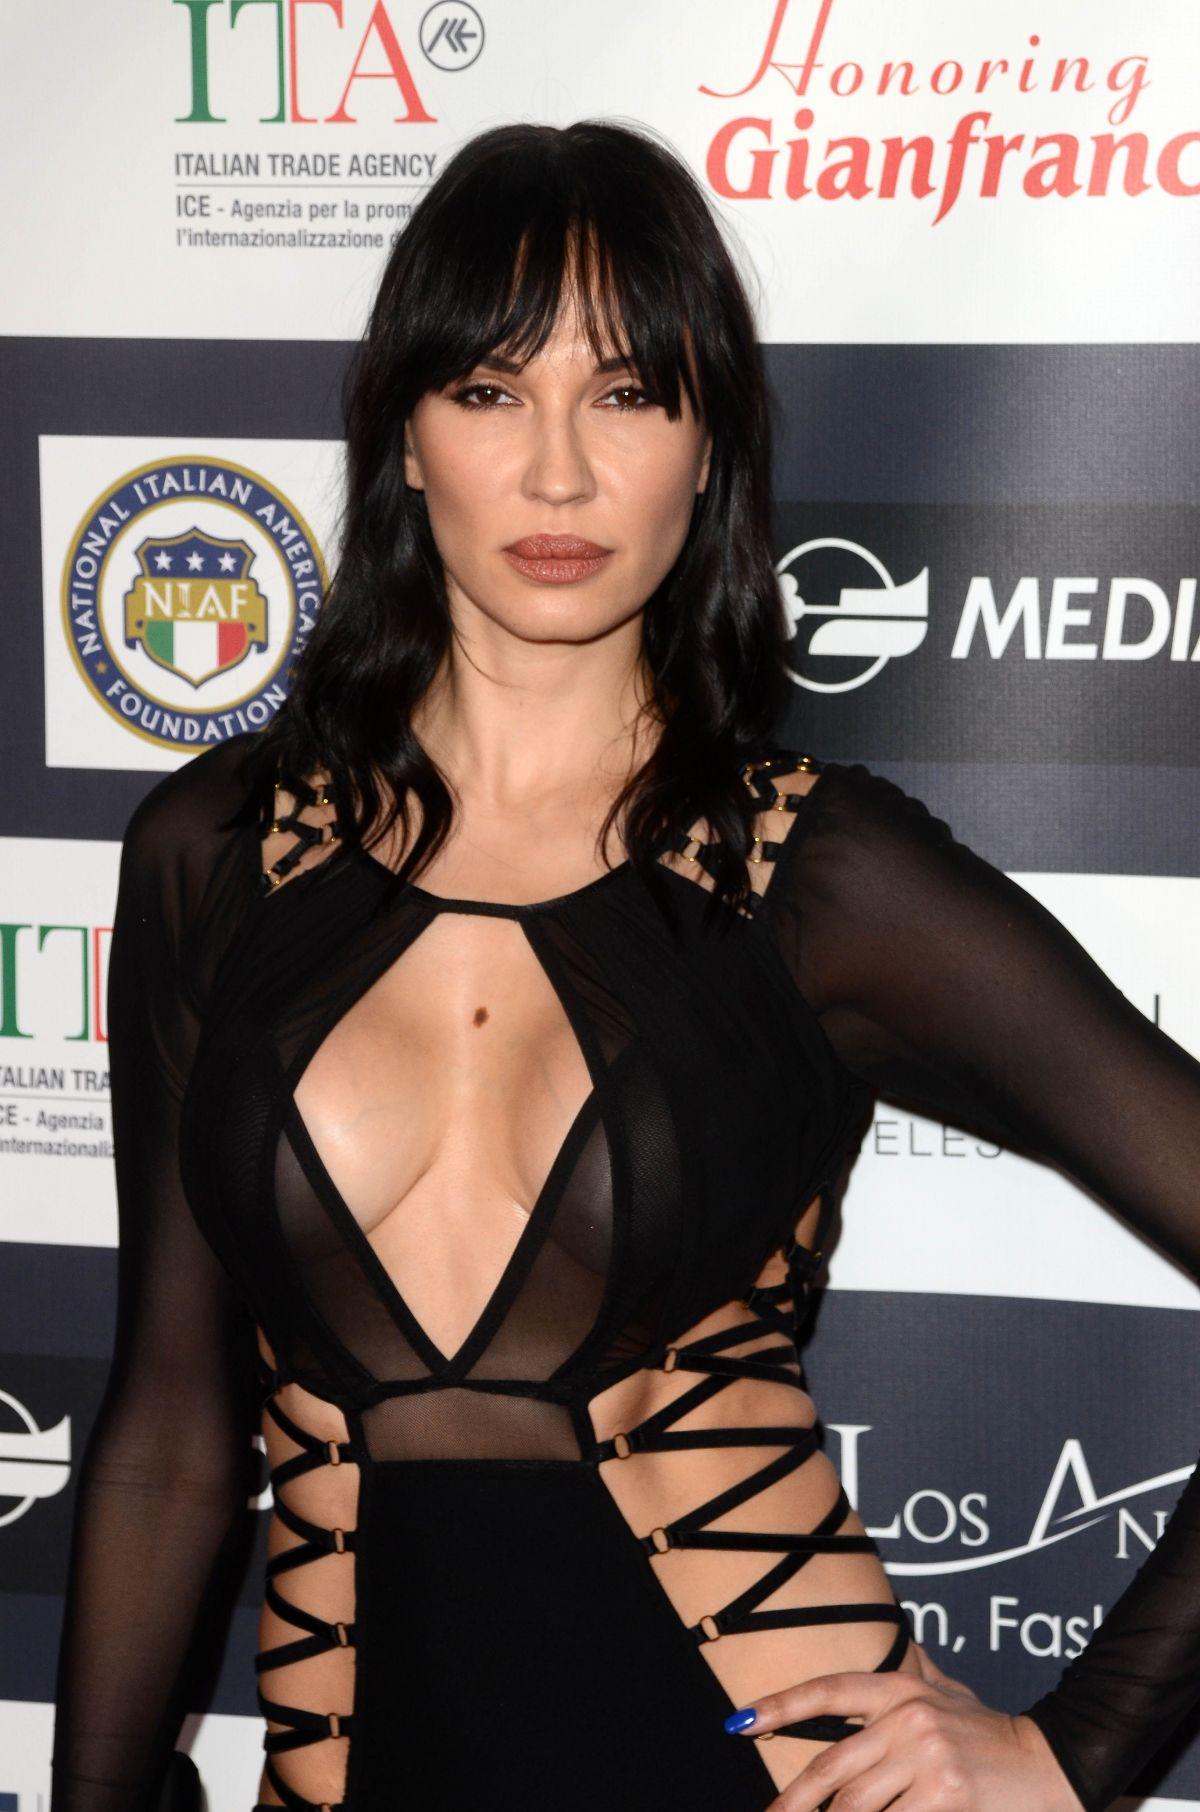 EVGENIYA CHERNYSHOVA at 12th Los Angeles Italia Film, Fashion and Art Festival 02/19/2017